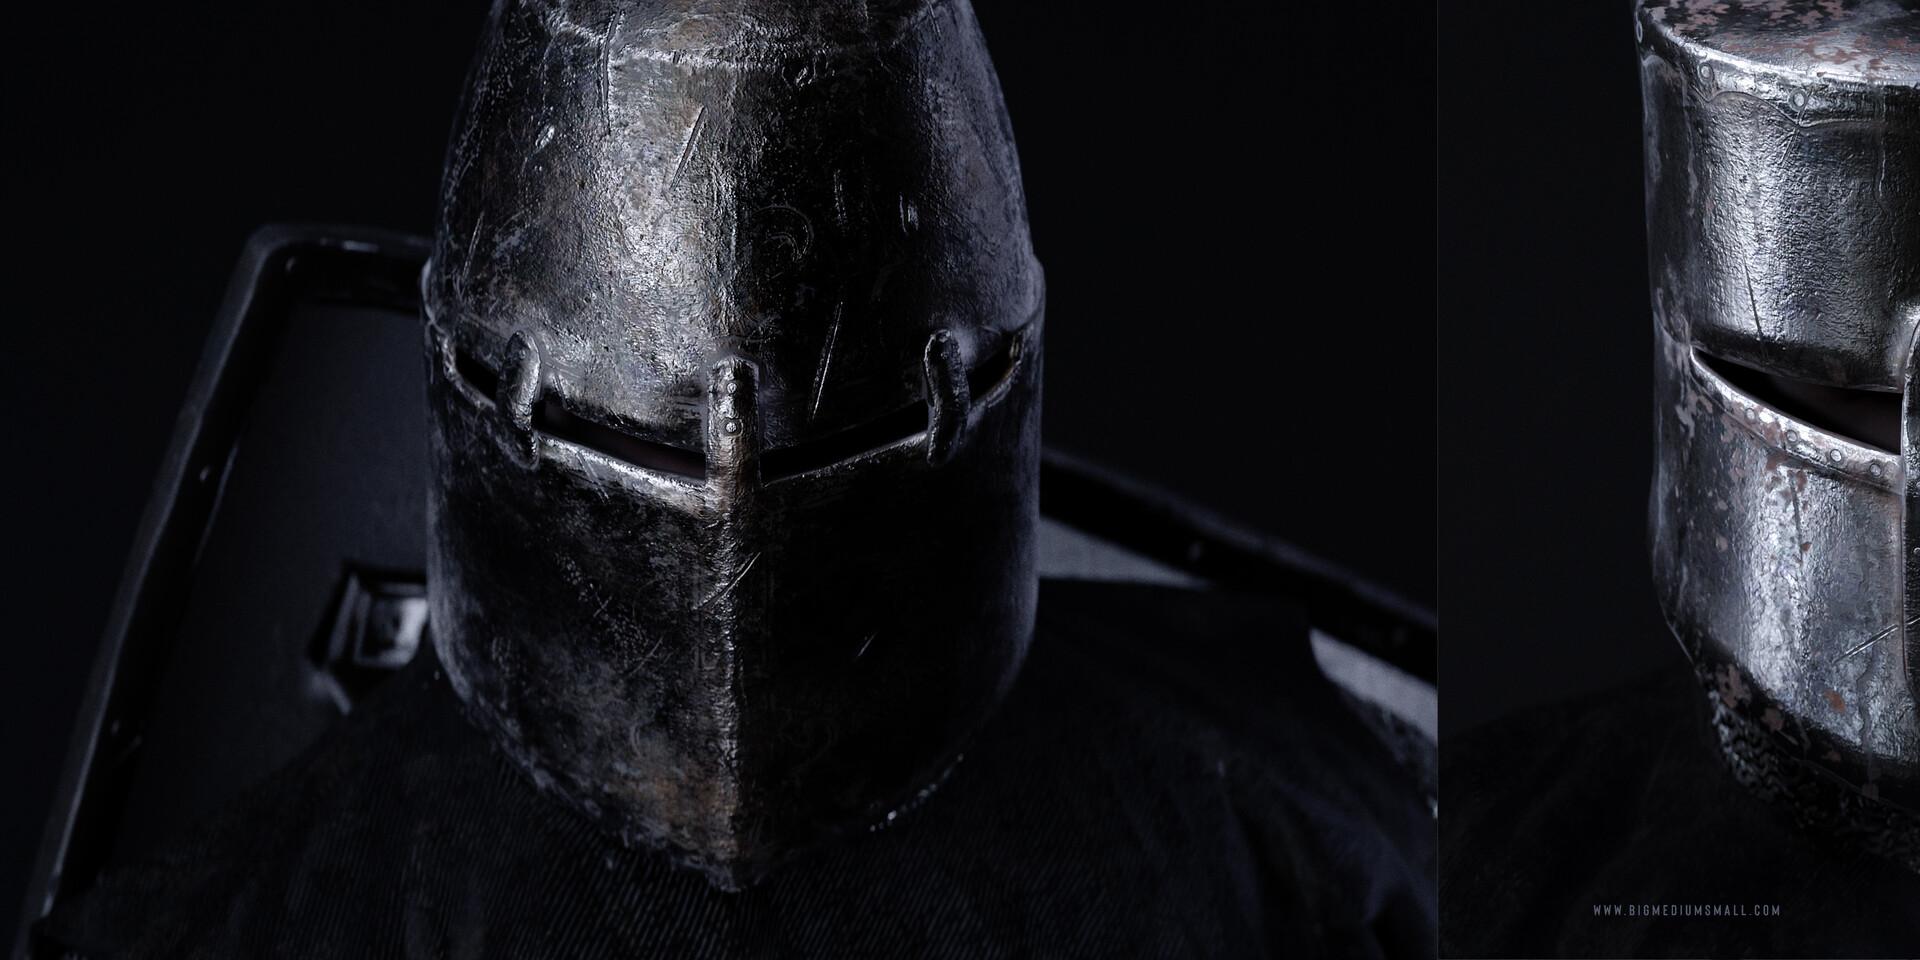 Oleg zherebin helmets 1